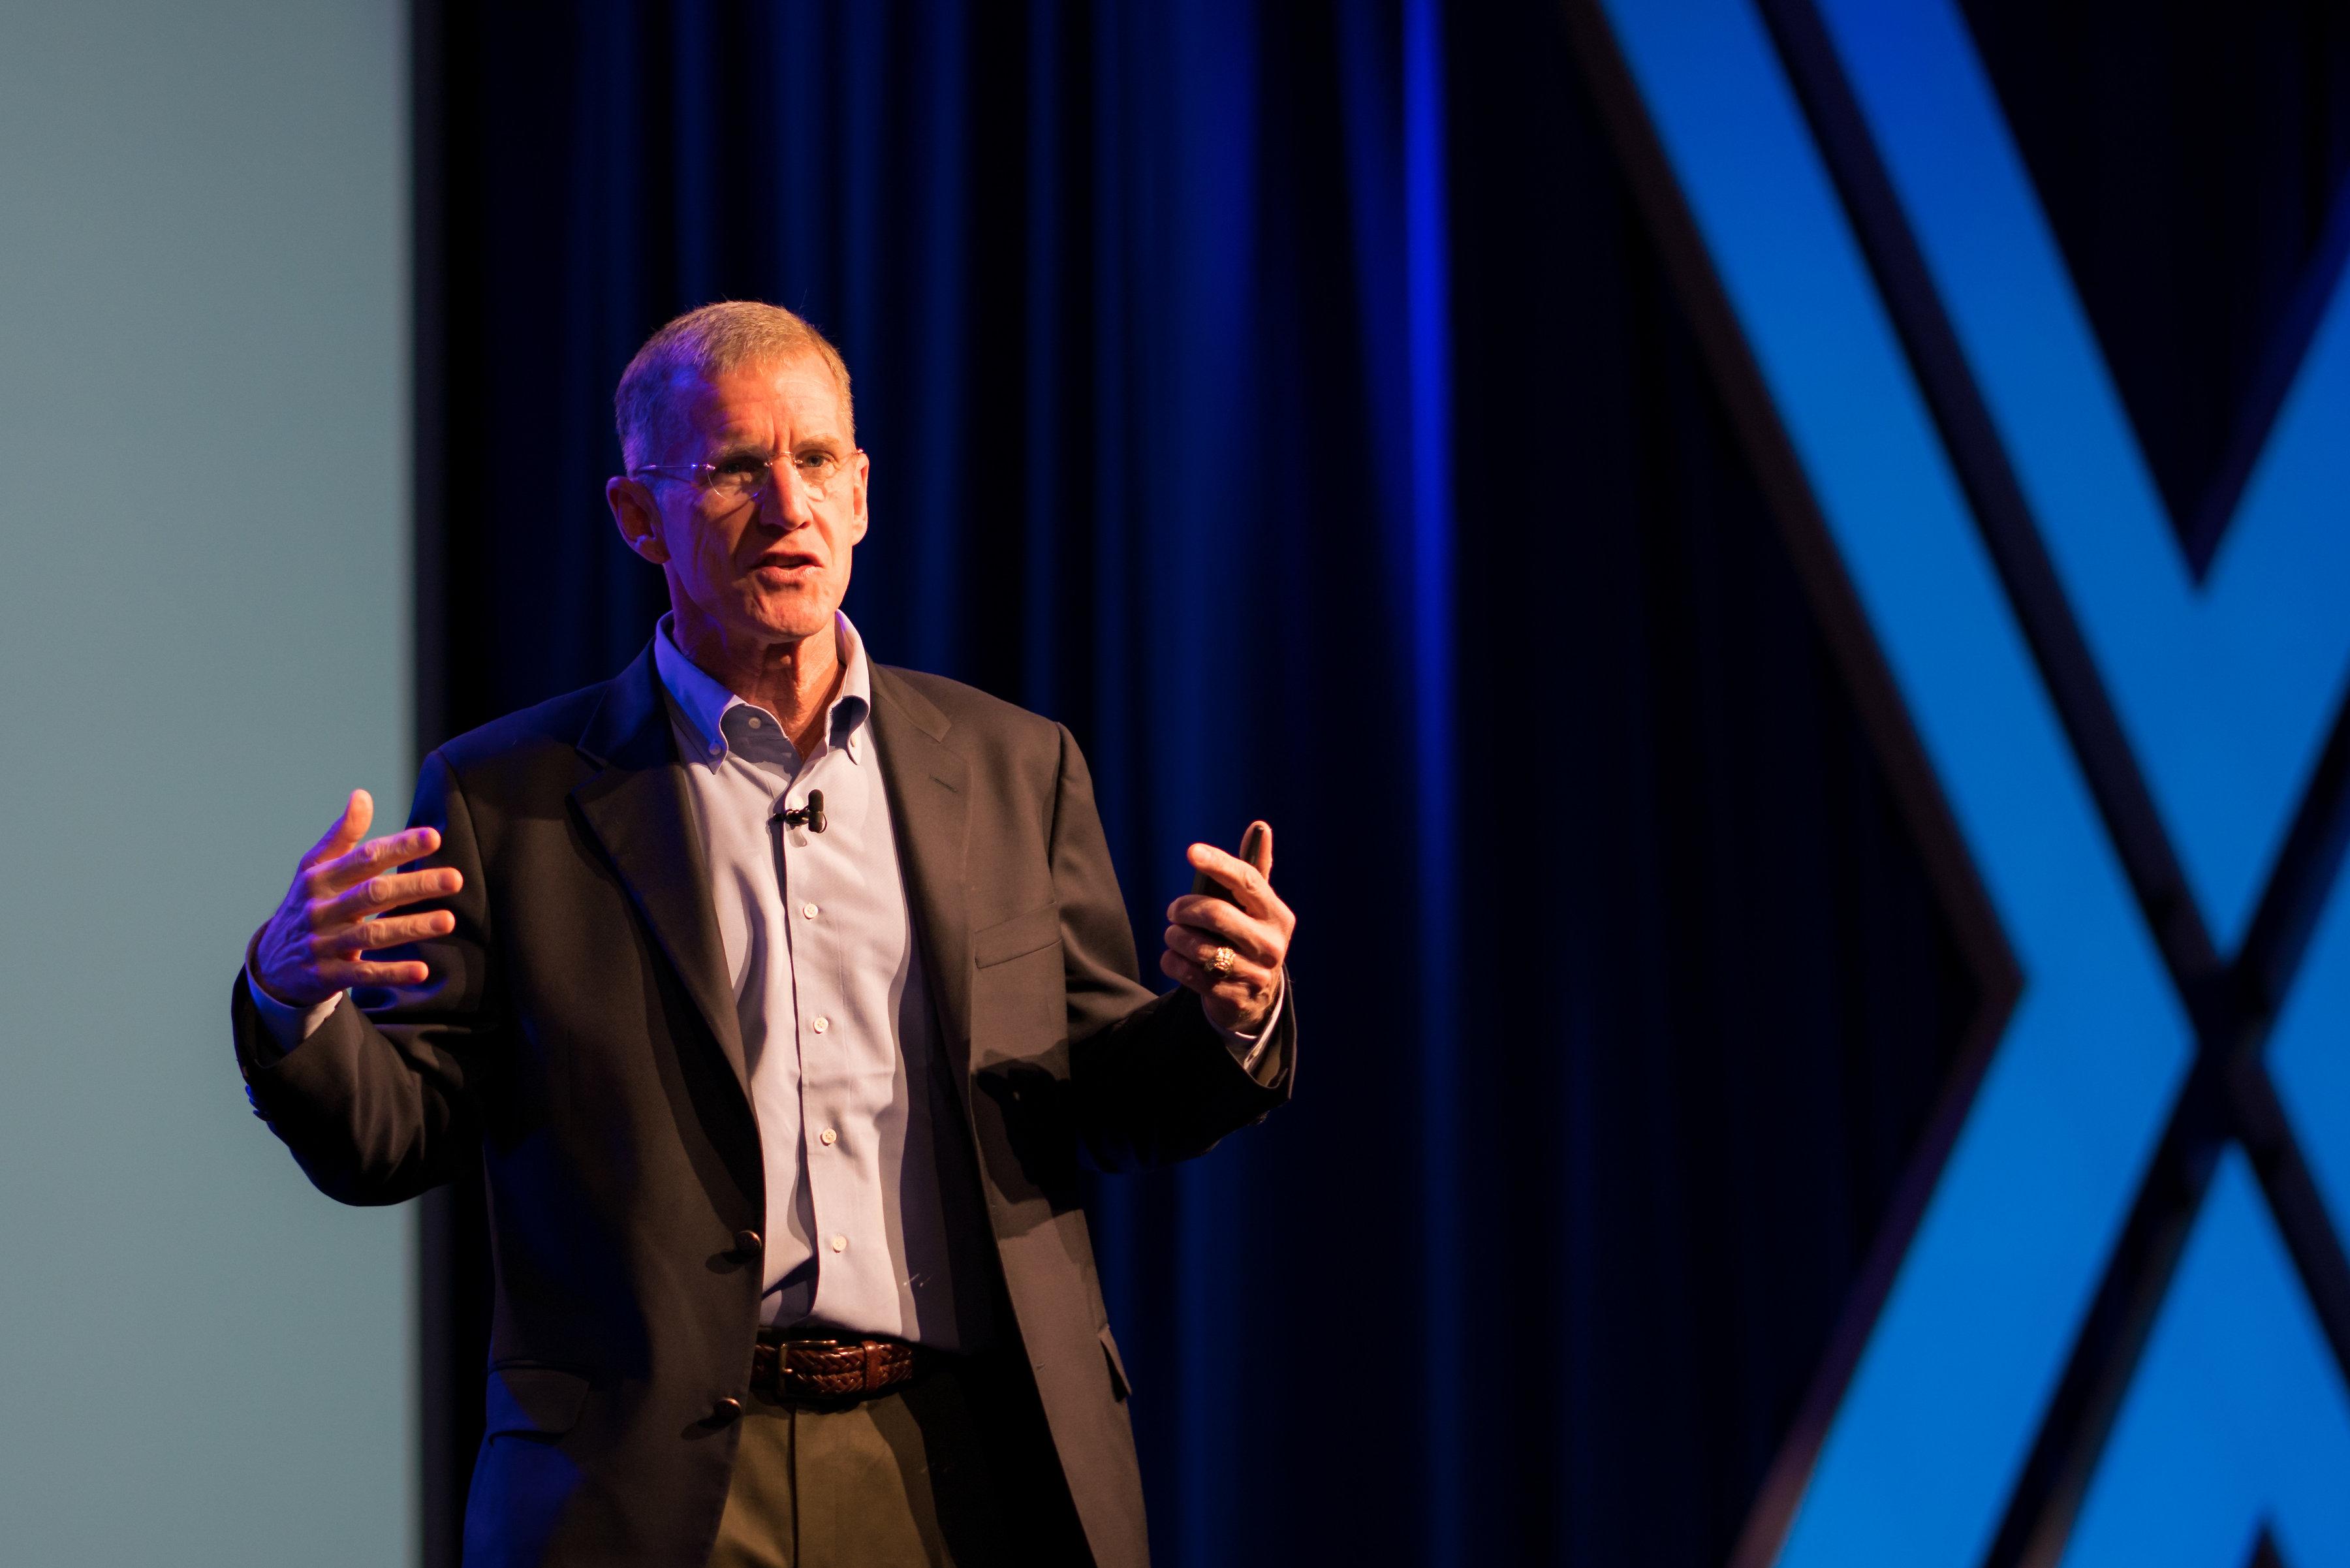 General Stanley McChrystal Talks Leadership With #EXP18 Attendees